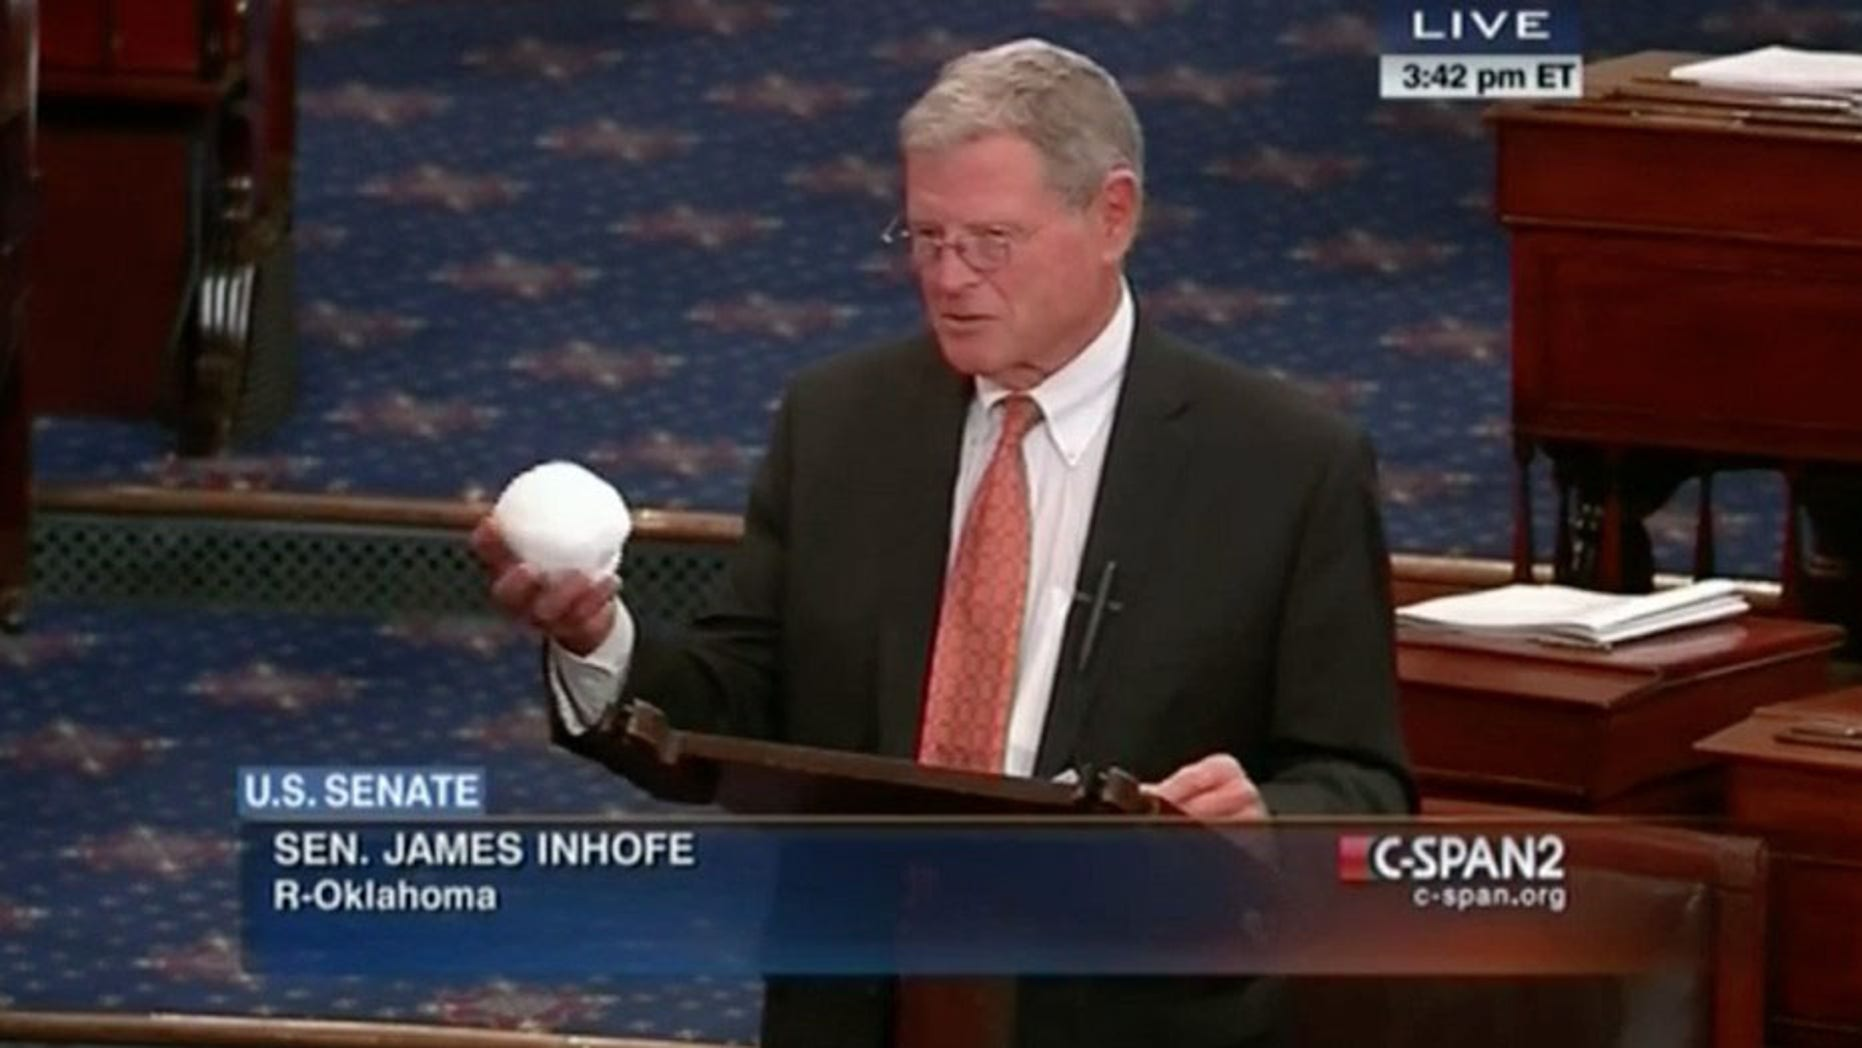 Sen. James Inhofe, R-Okla., holds up a snowball during a speech on the Senate floor on February 26, 2015. (Screenshot from C-SPAN)